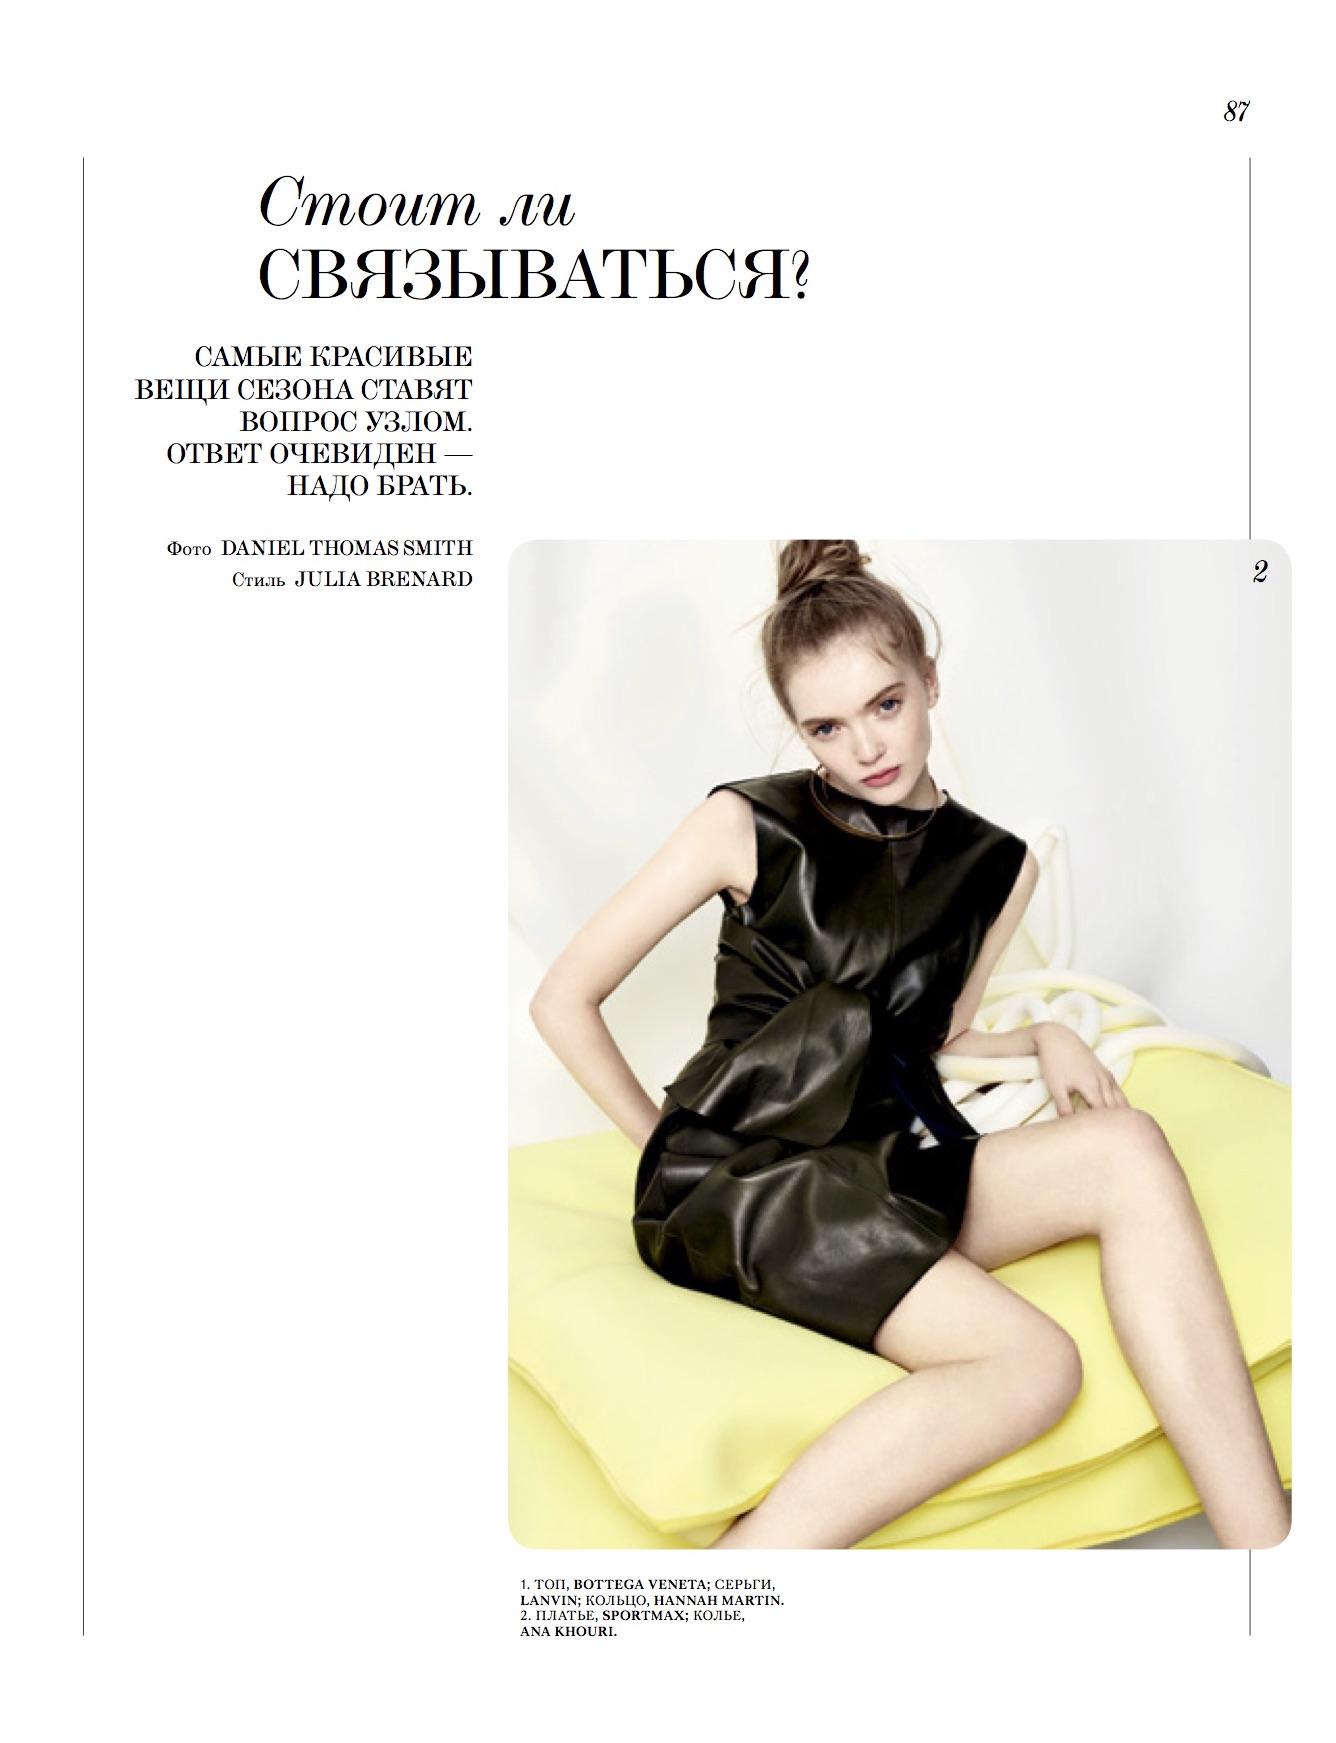 InterviewRUSMARS15uliaBrenardAK.jpg